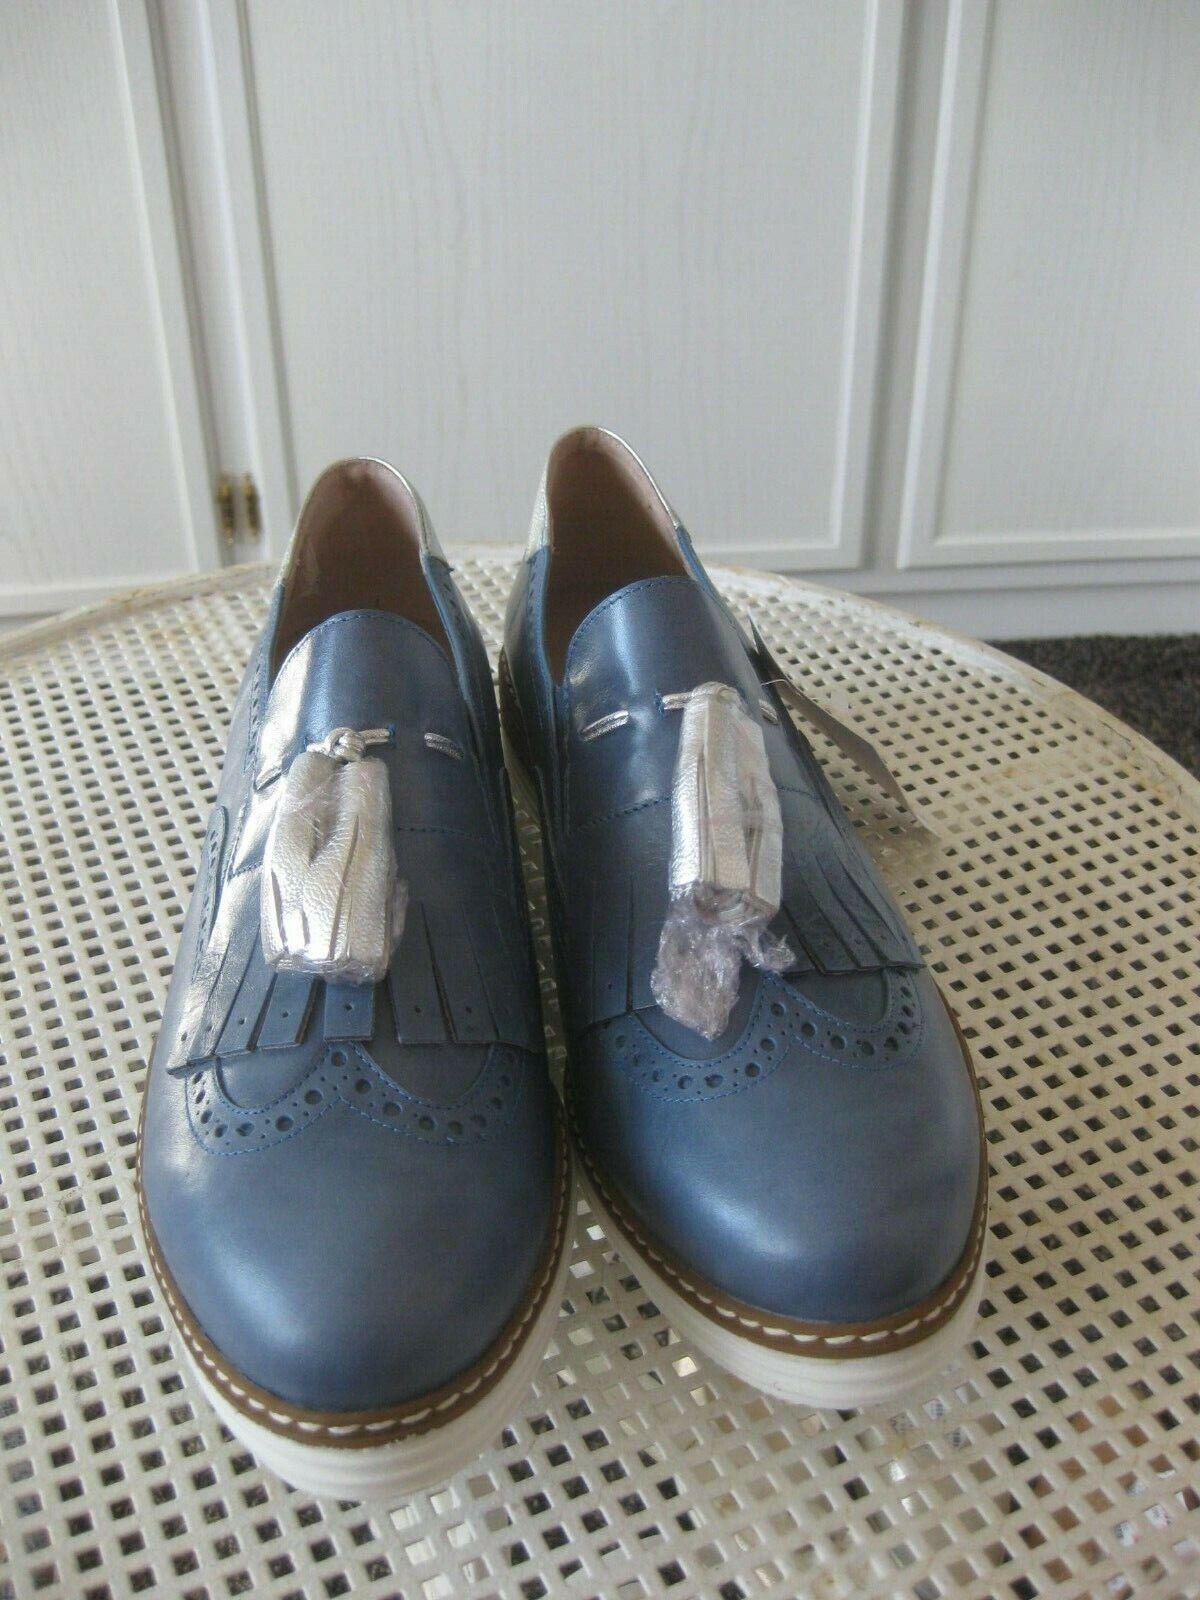 Scarpio joli Pantoufles Chaussure Taille 8 42 NEUF